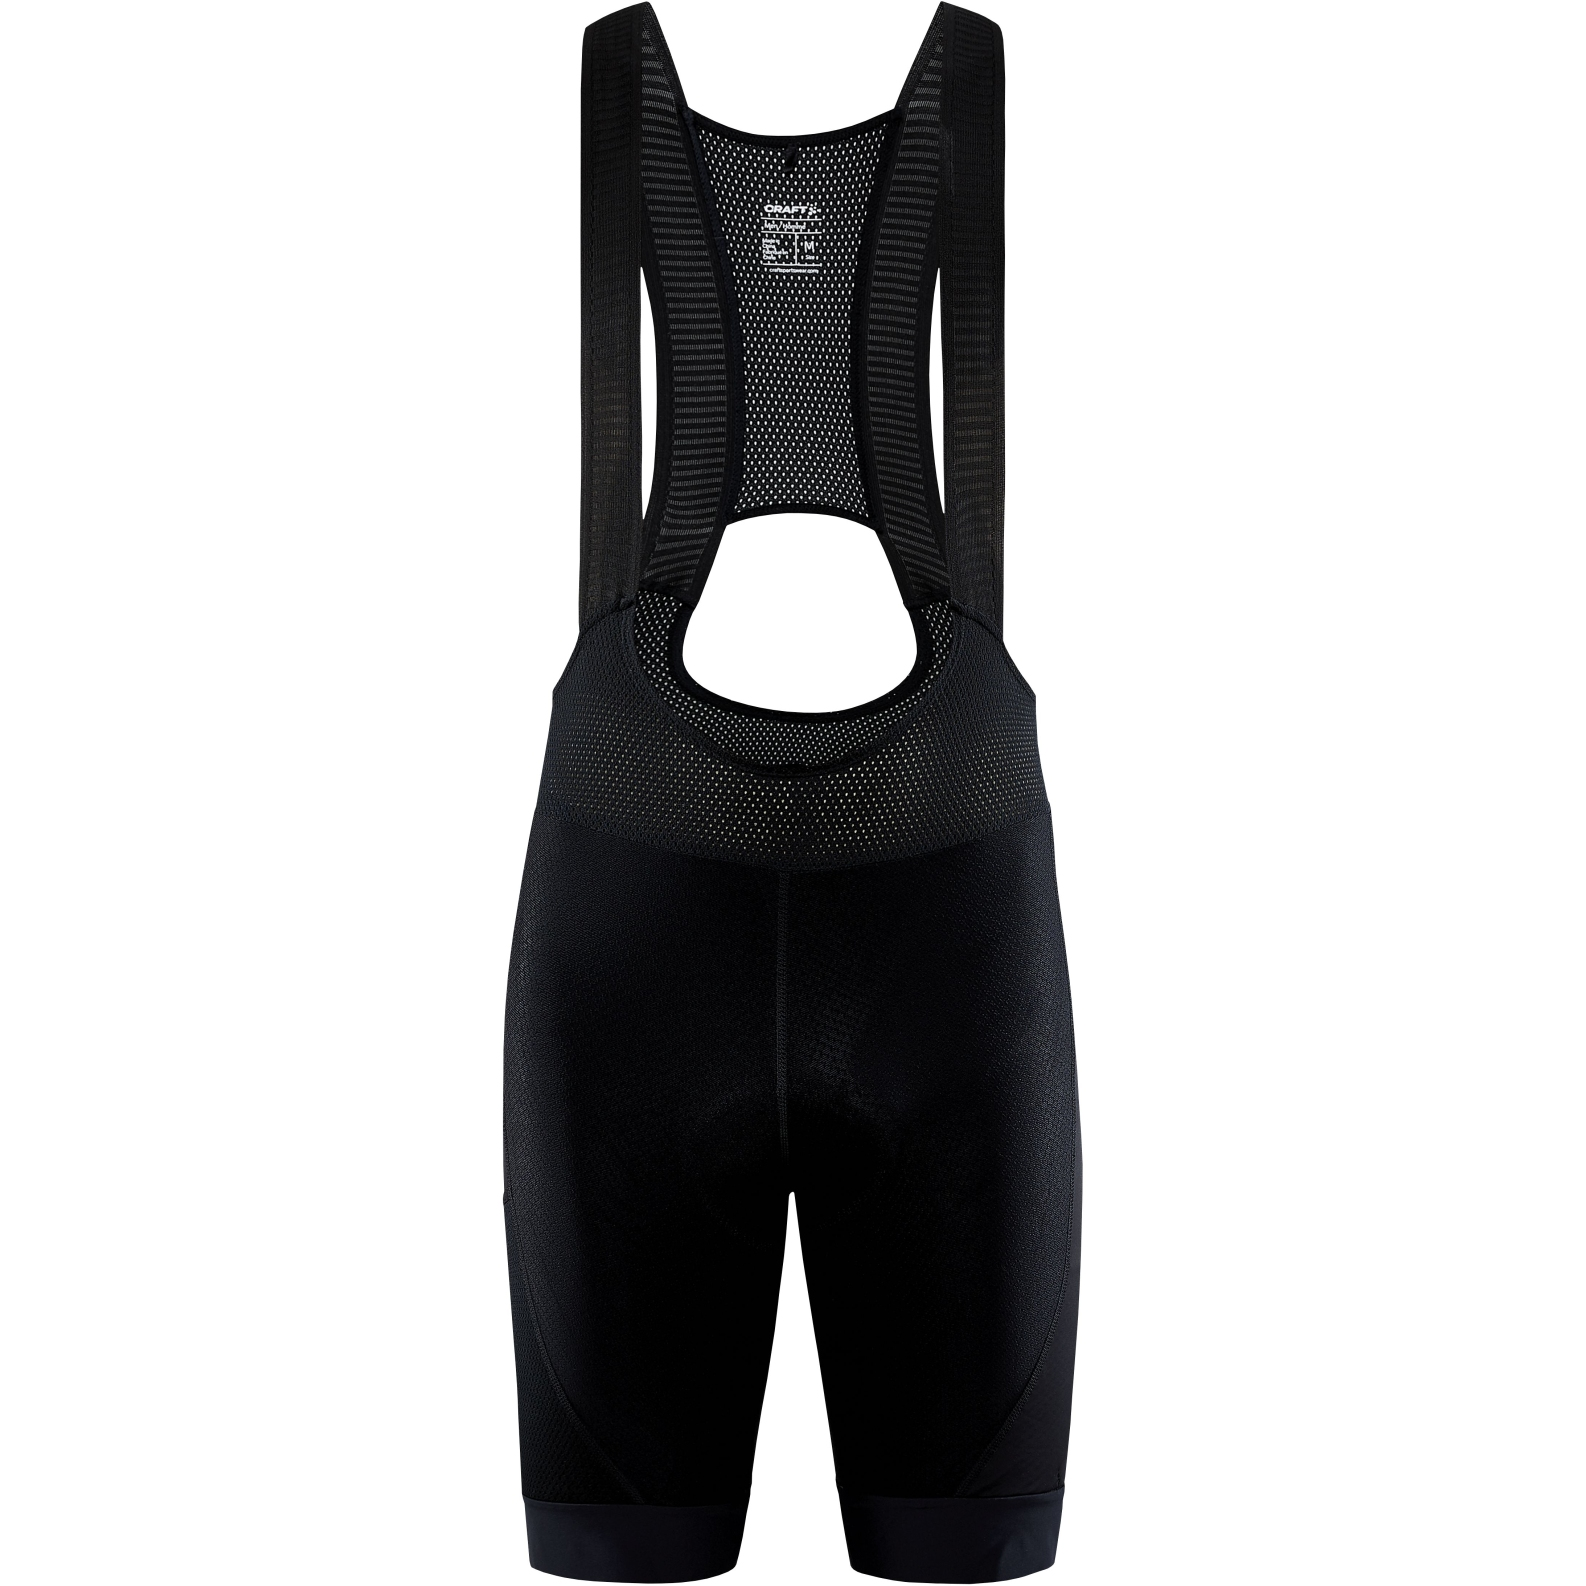 CRAFT ADV Offroad Men's Bib Shorts 1910570 - 999000 Black